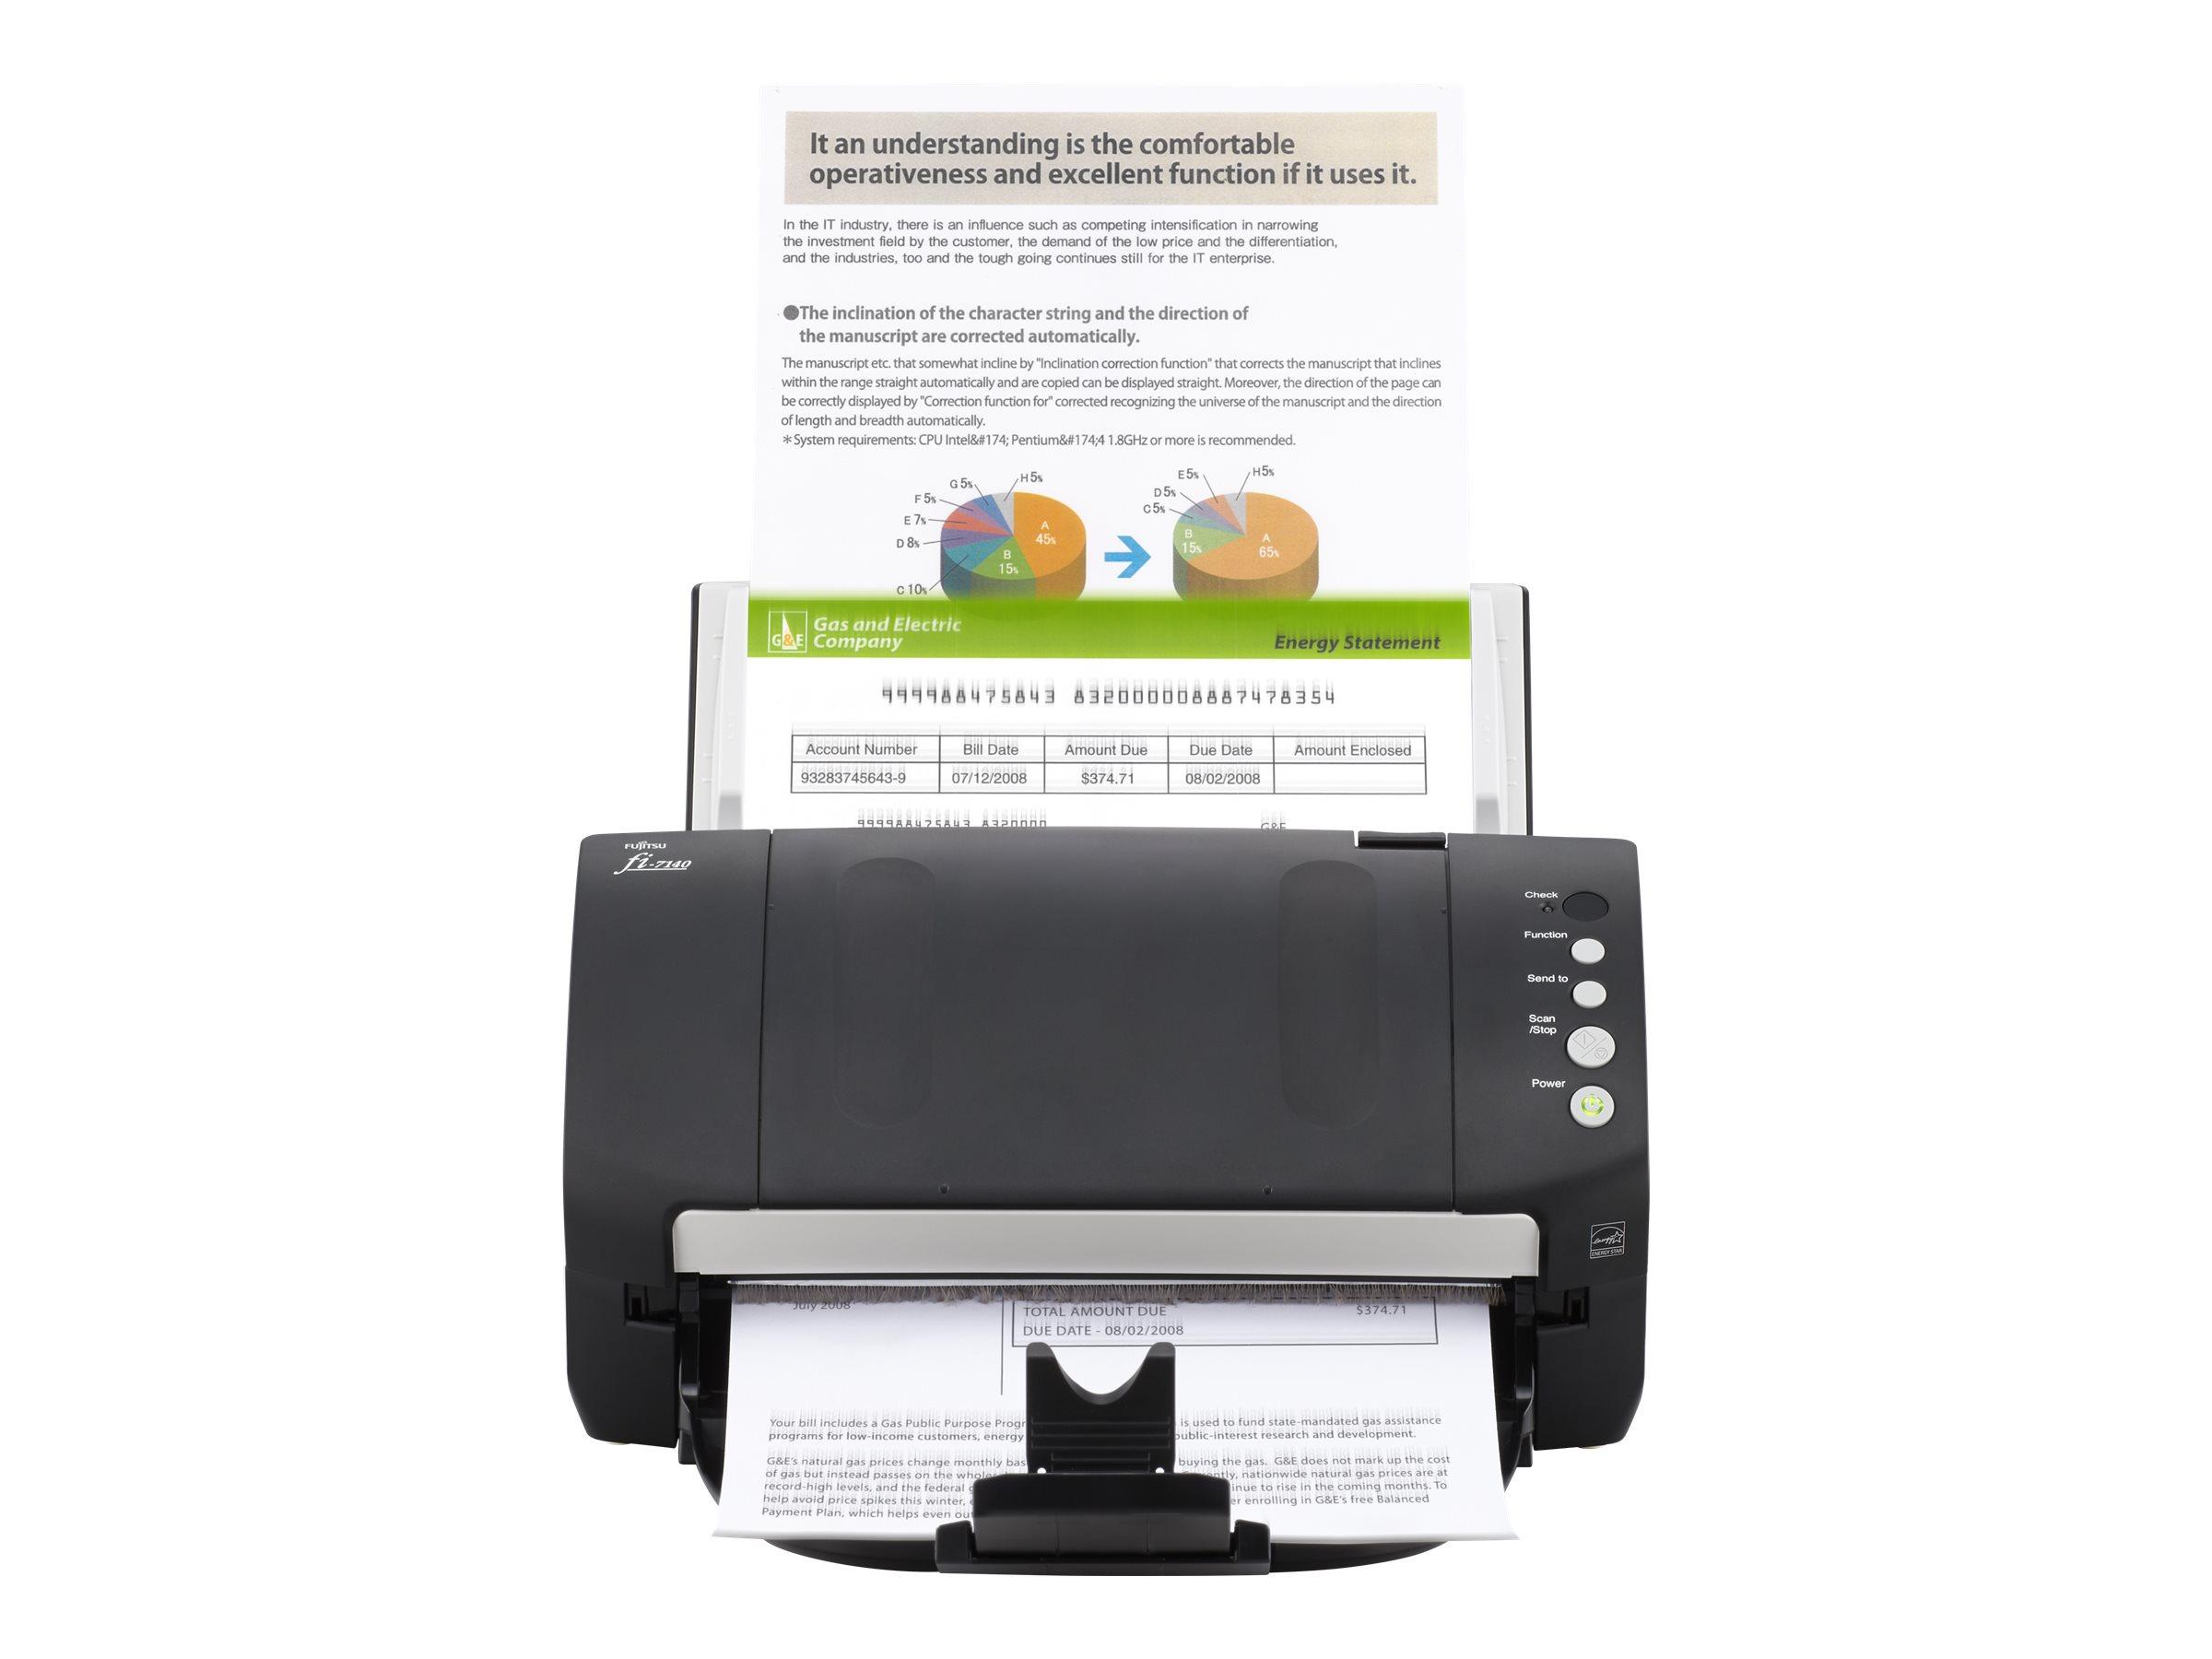 Fujitsu fi-7140 - Dokumentenscanner - Dual CCD - Duplex - 216 x 355.6 mm - 600 dpi x 600 dpi - bis zu 40 Seiten/Min. (einfarbig)